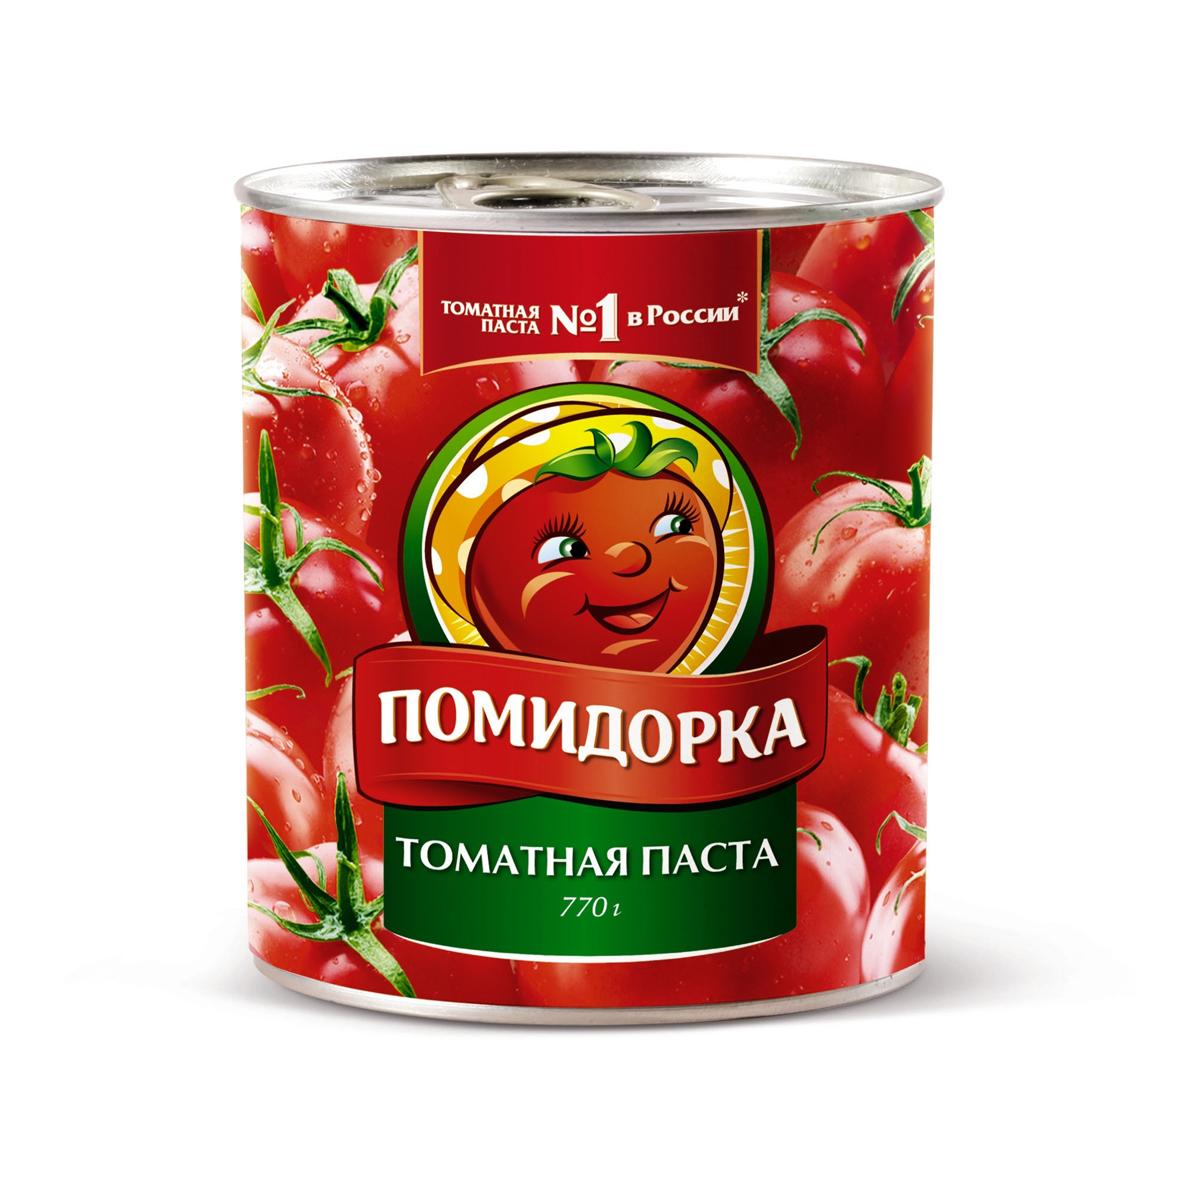 Помидорка Томатная паста, 770 г томатная паста помидорка 250мл